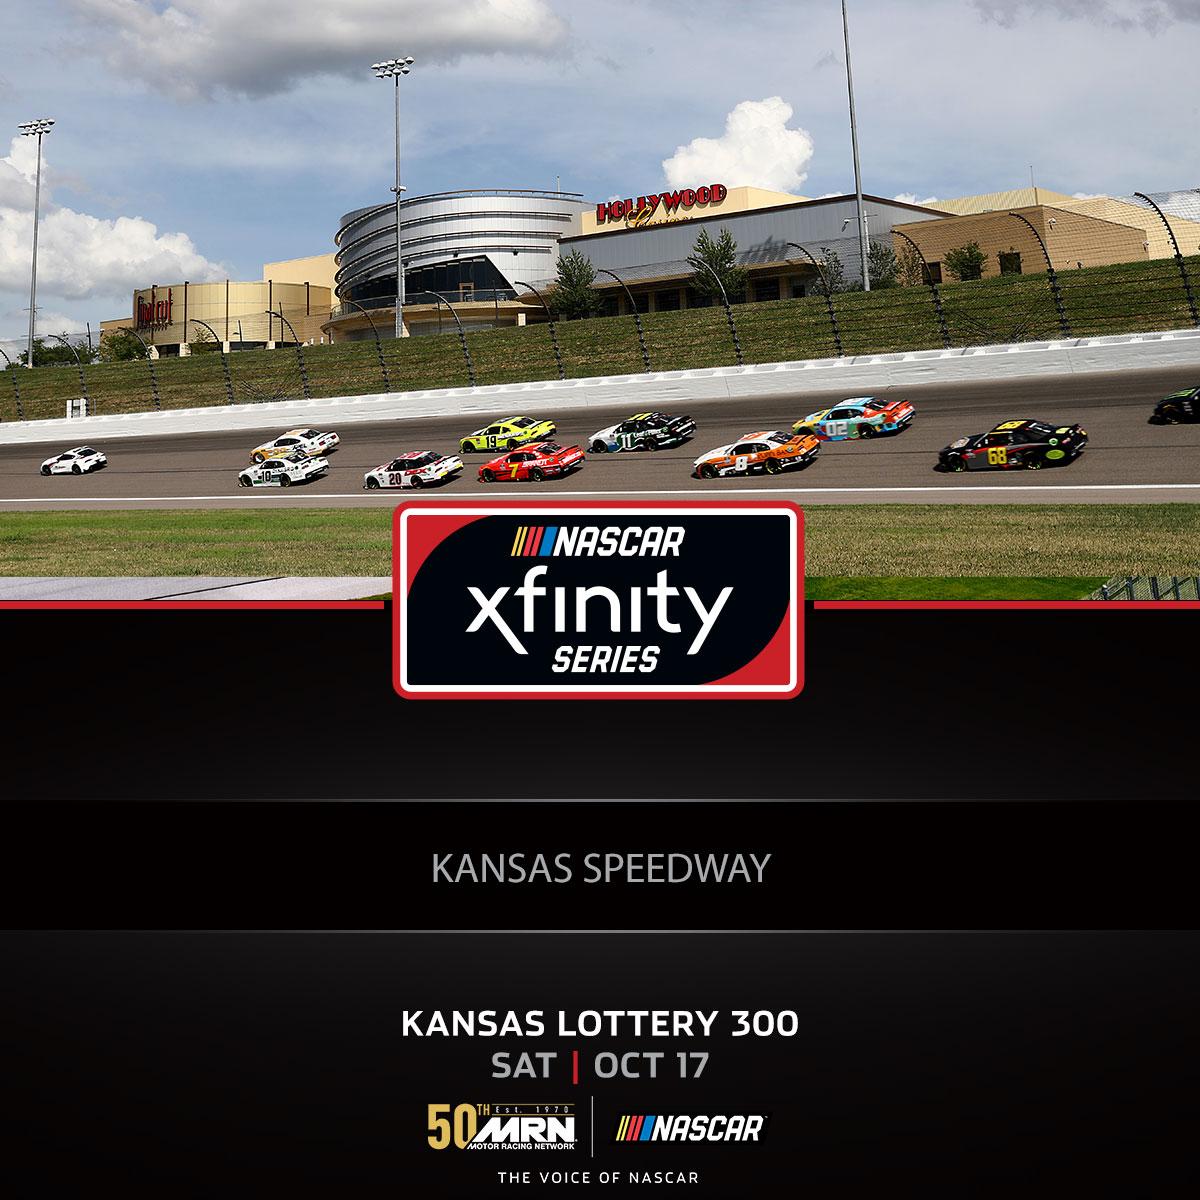 COMING UP IN ONE HOUR! Tune in for the @NASCAR_Xfinity #KSL300 @kansasspeedway #AskMRN | #NASCARPlayoffs